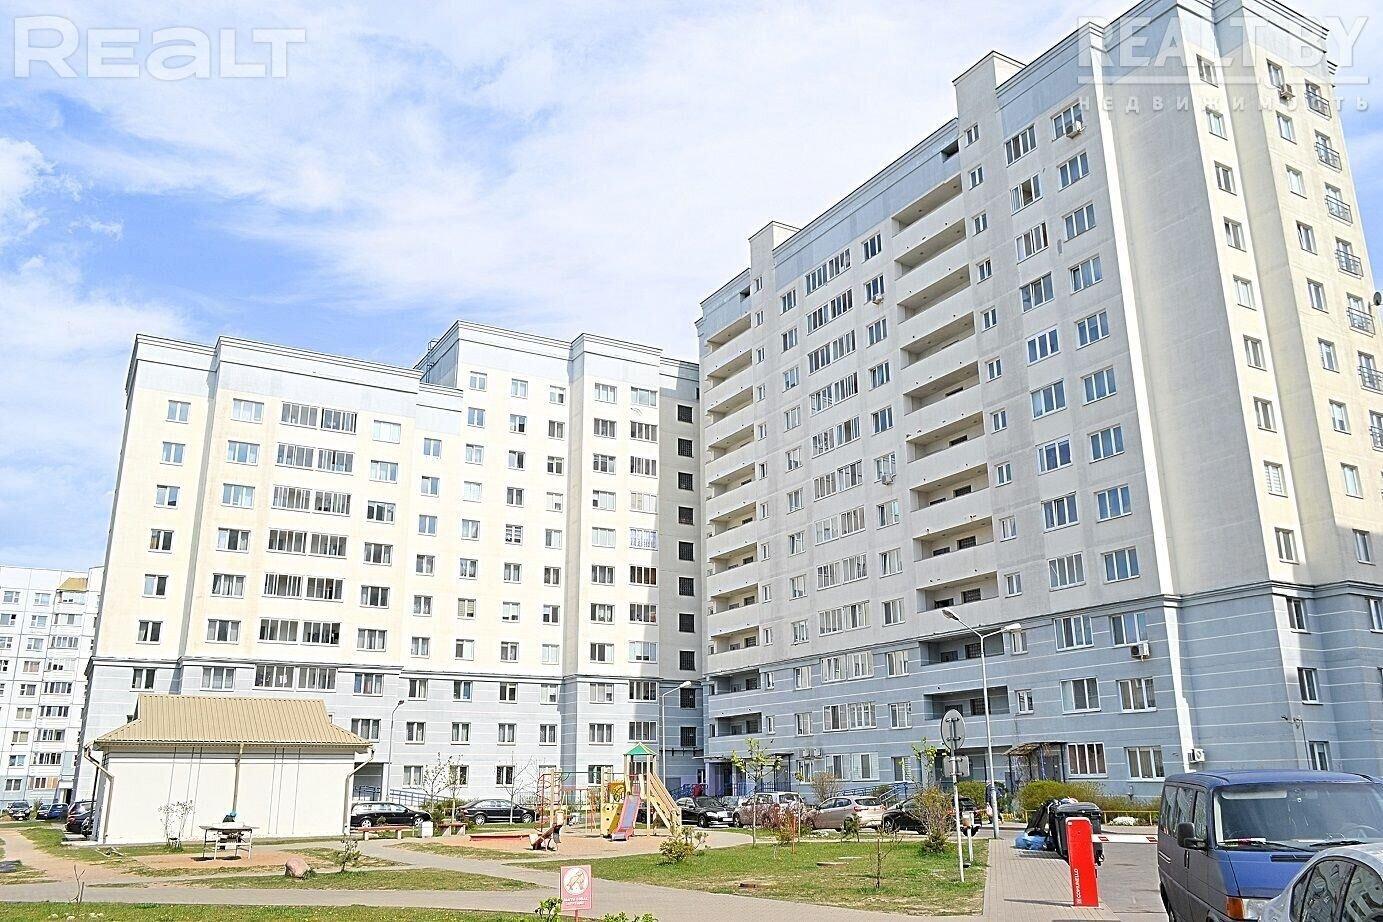 Продажа 3-х комнатной квартиры в г. Минске, ул. Неманская, дом 5 (р-н Каменная горка). Цена 193 643 руб